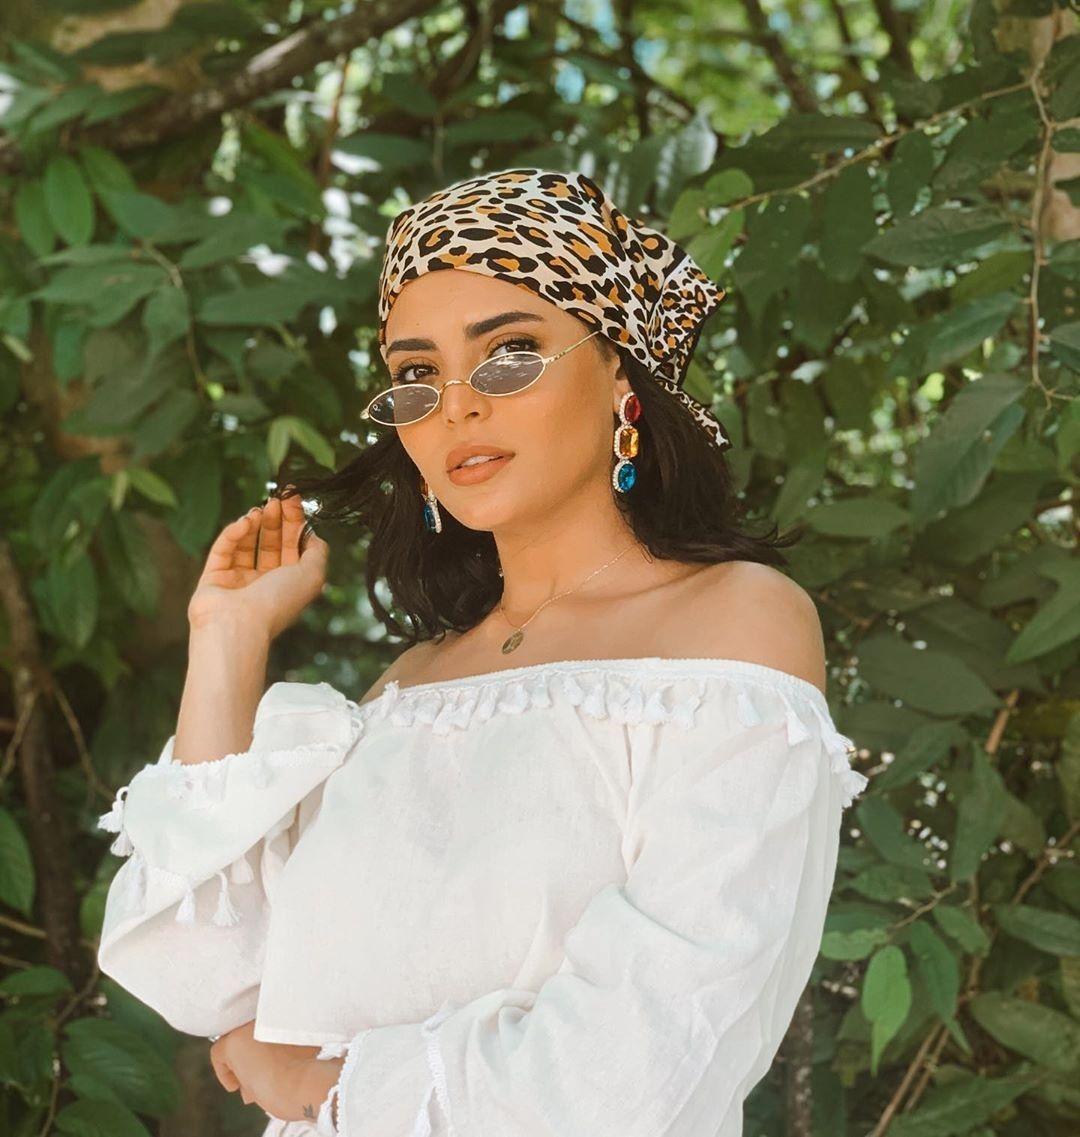 Pin By Nefertiti On Egyptian Pharaonic Beauty Egyptian Actress Cute Summer Outfits Beauty